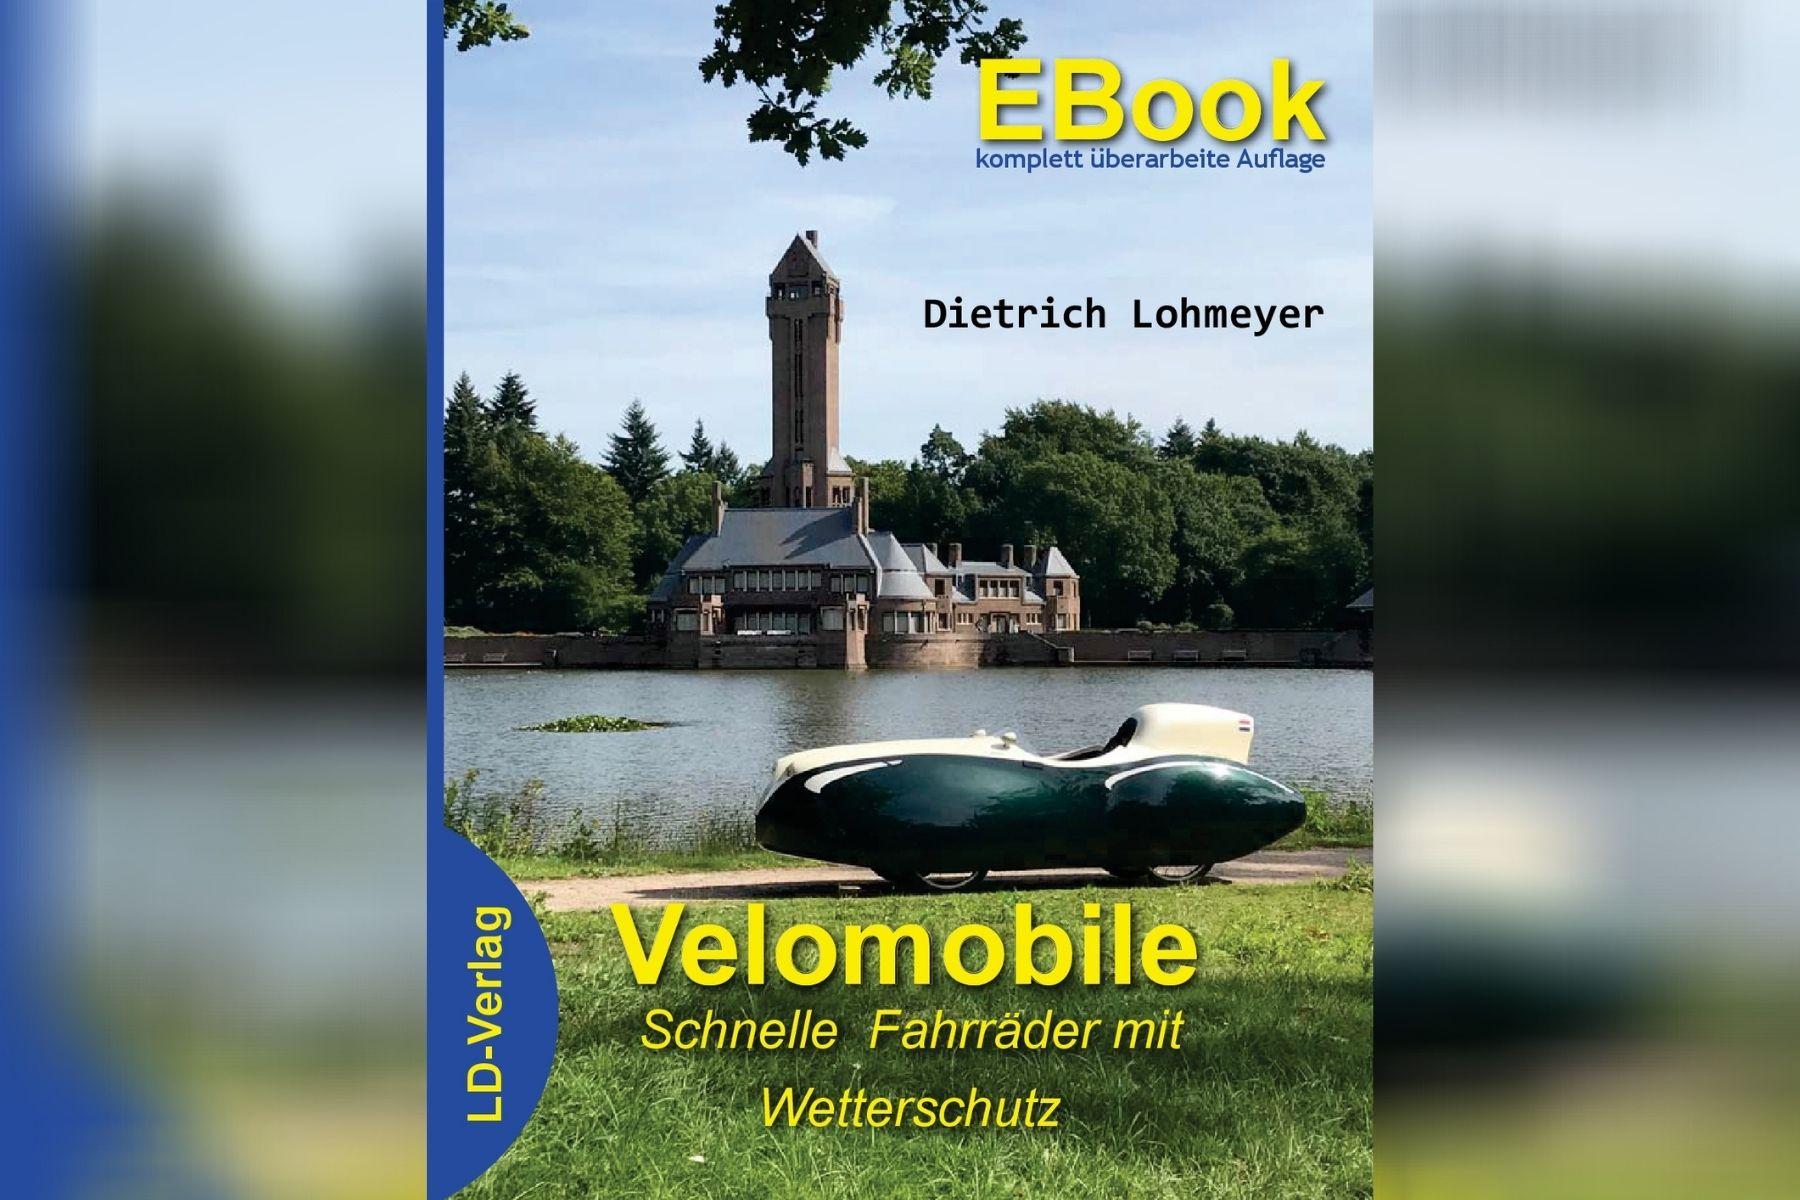 Lesetipp: E-Book über Velomobile